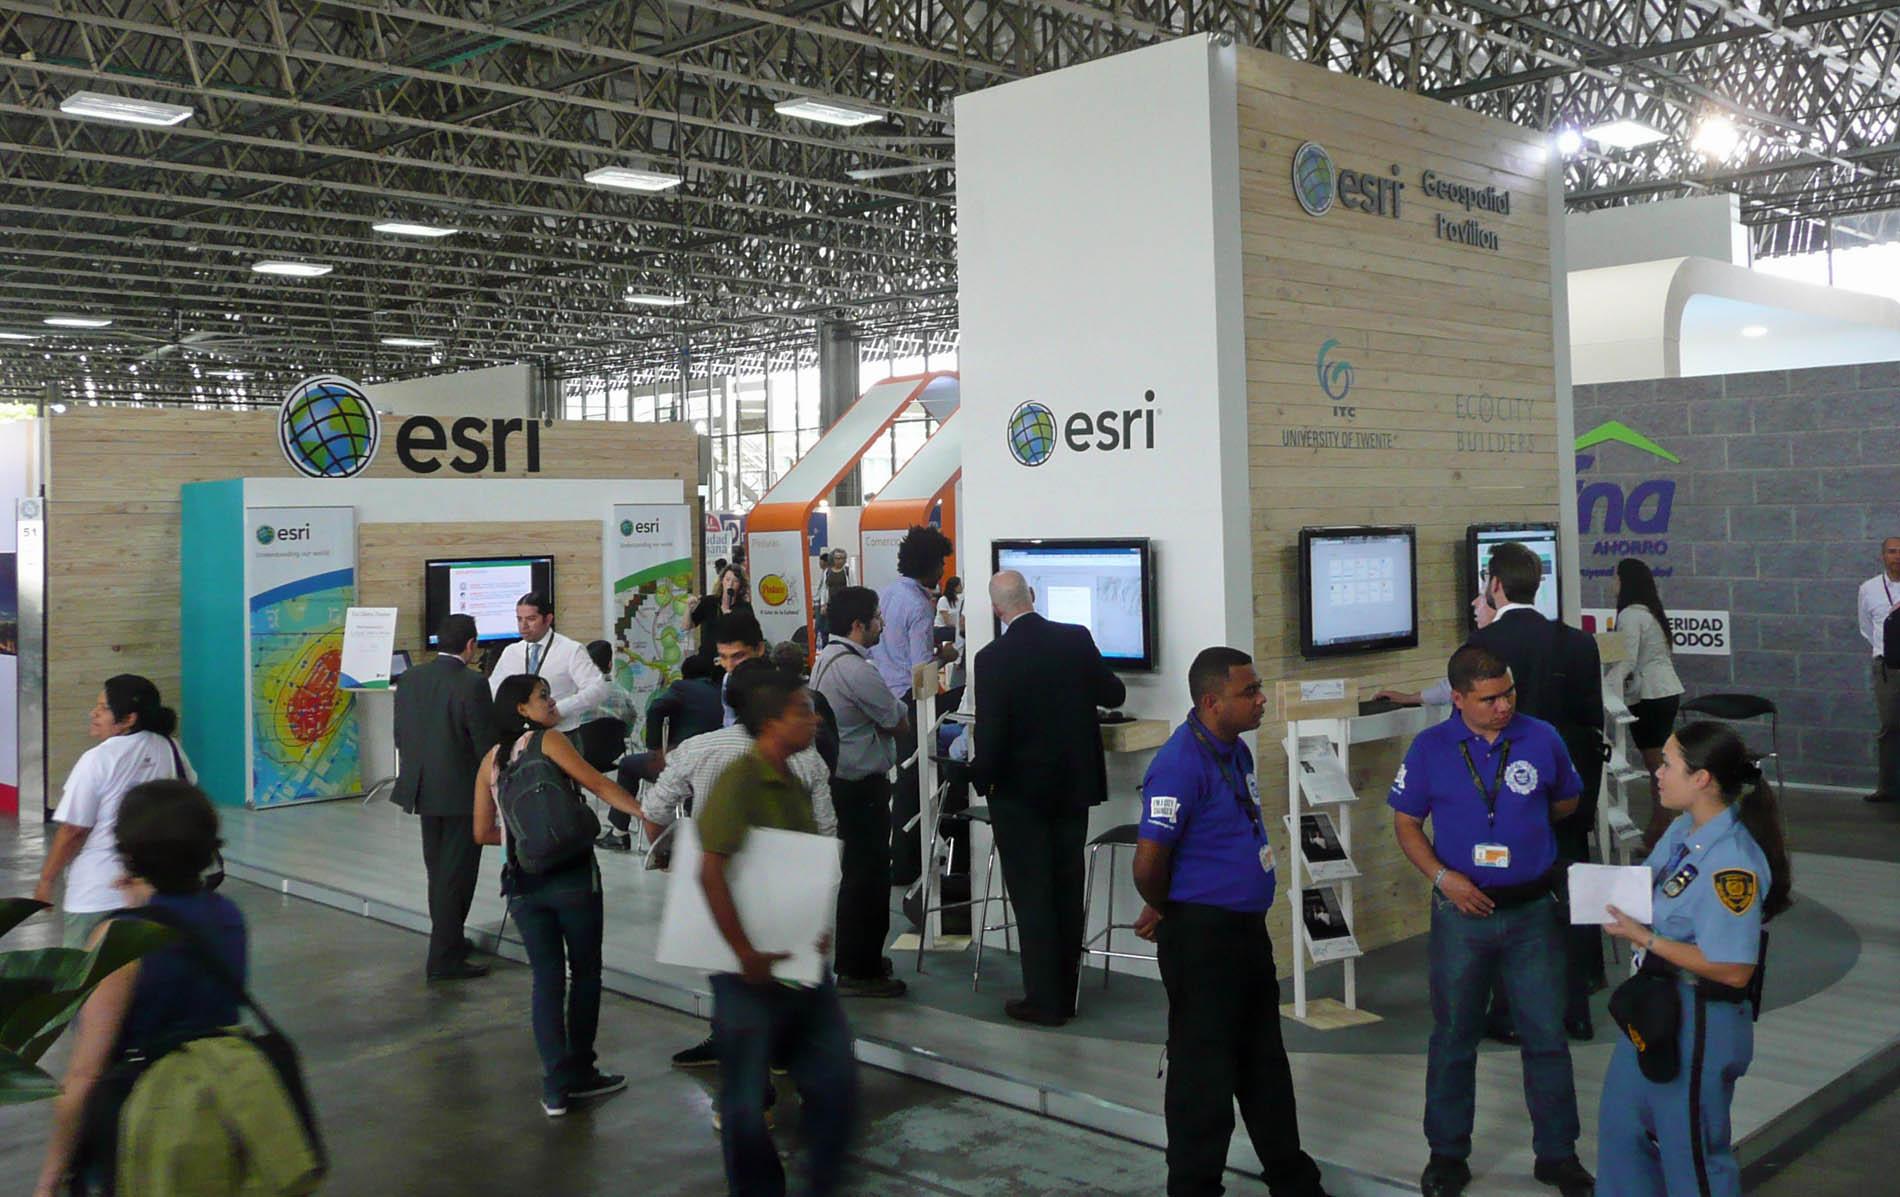 In Medellín at last, Ecocity Builders sets up in the Esri pavillion.